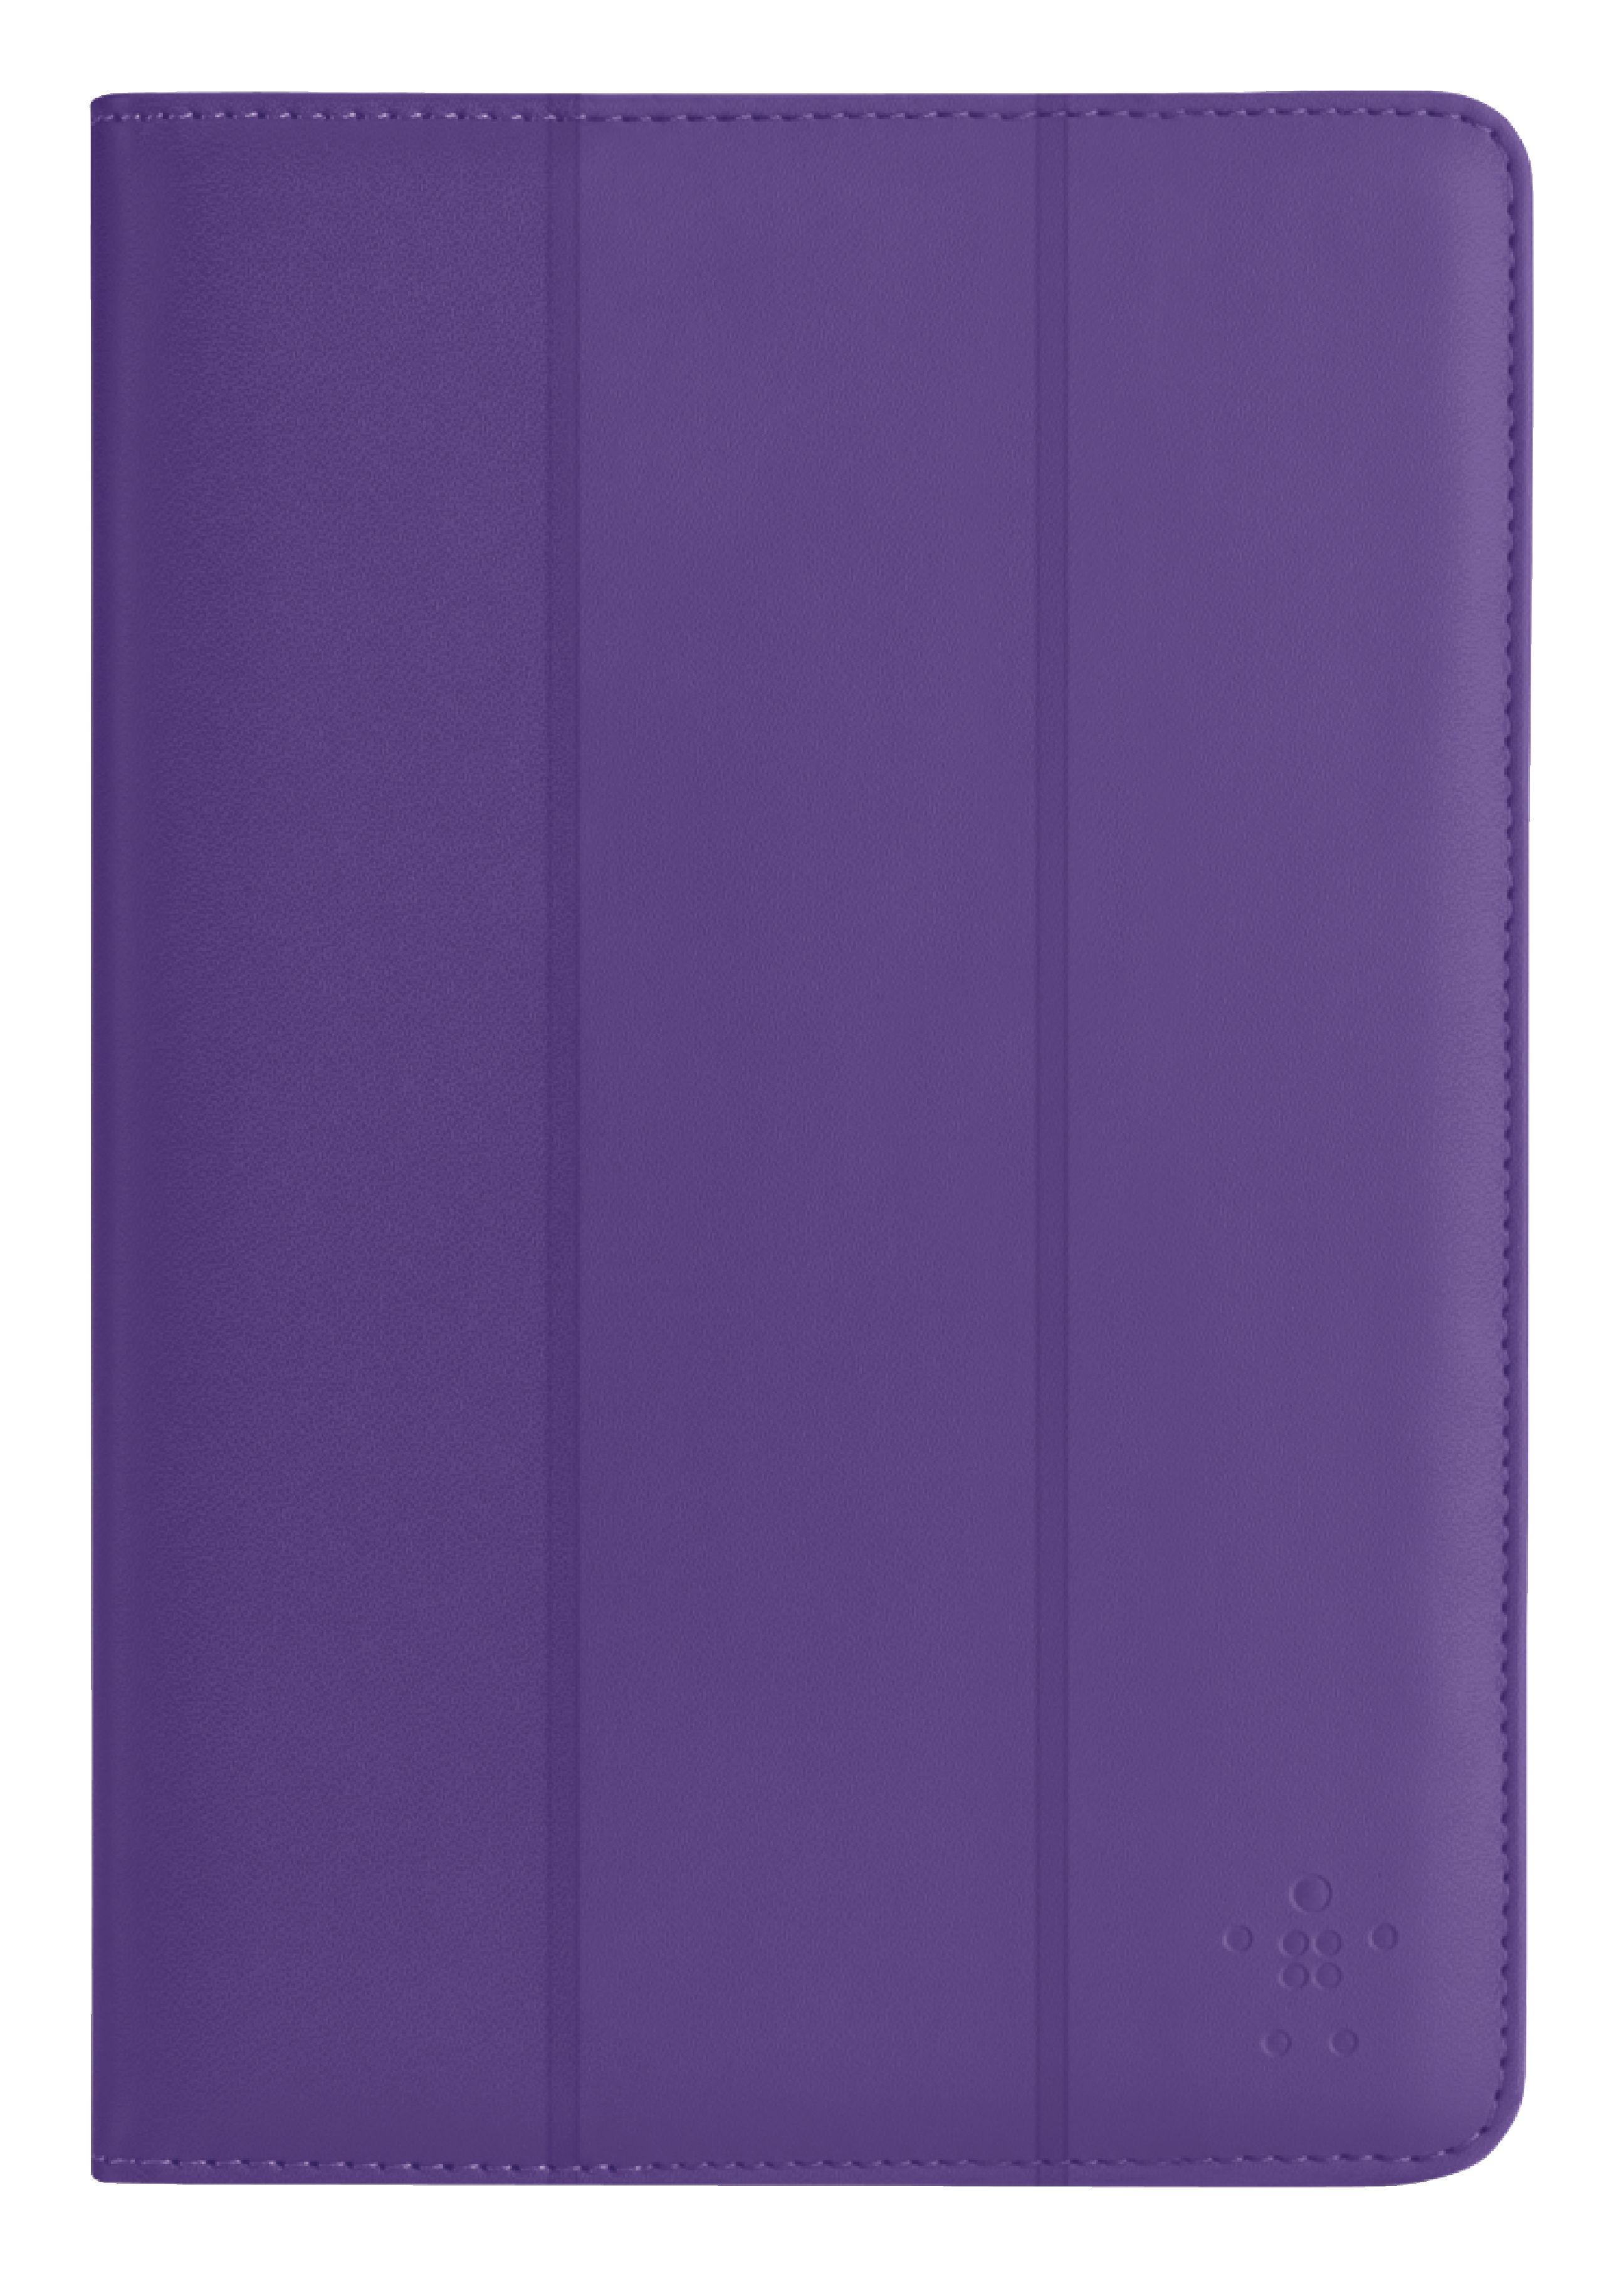 accbel00961b belkin etui de protection pour tablette. Black Bedroom Furniture Sets. Home Design Ideas